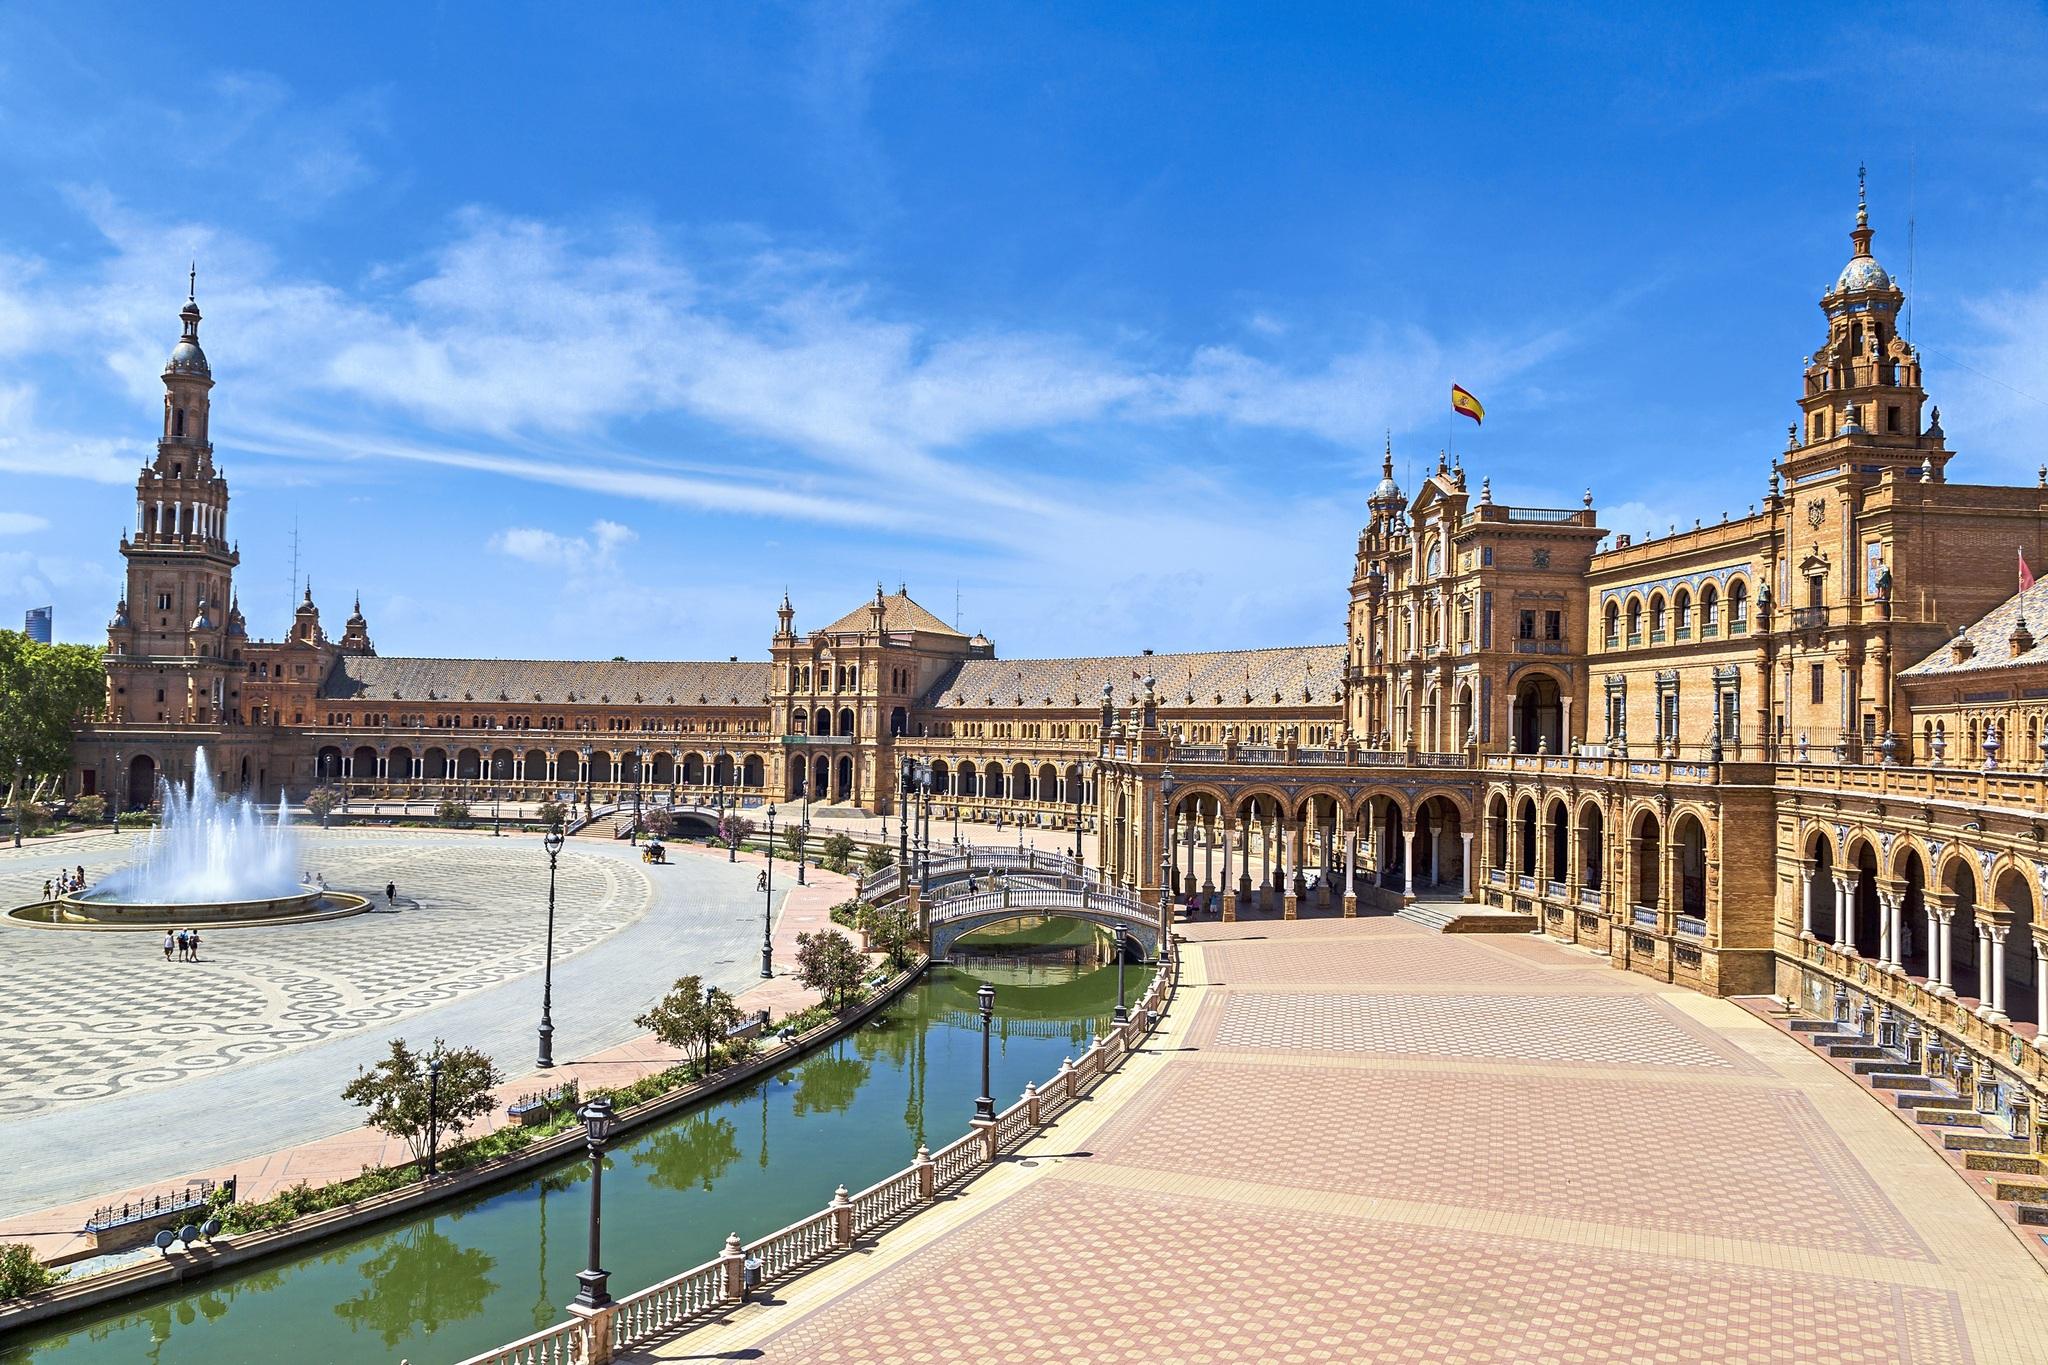 Spanien Andalusien Sevilla Spanischer Platz Plaza de Europa